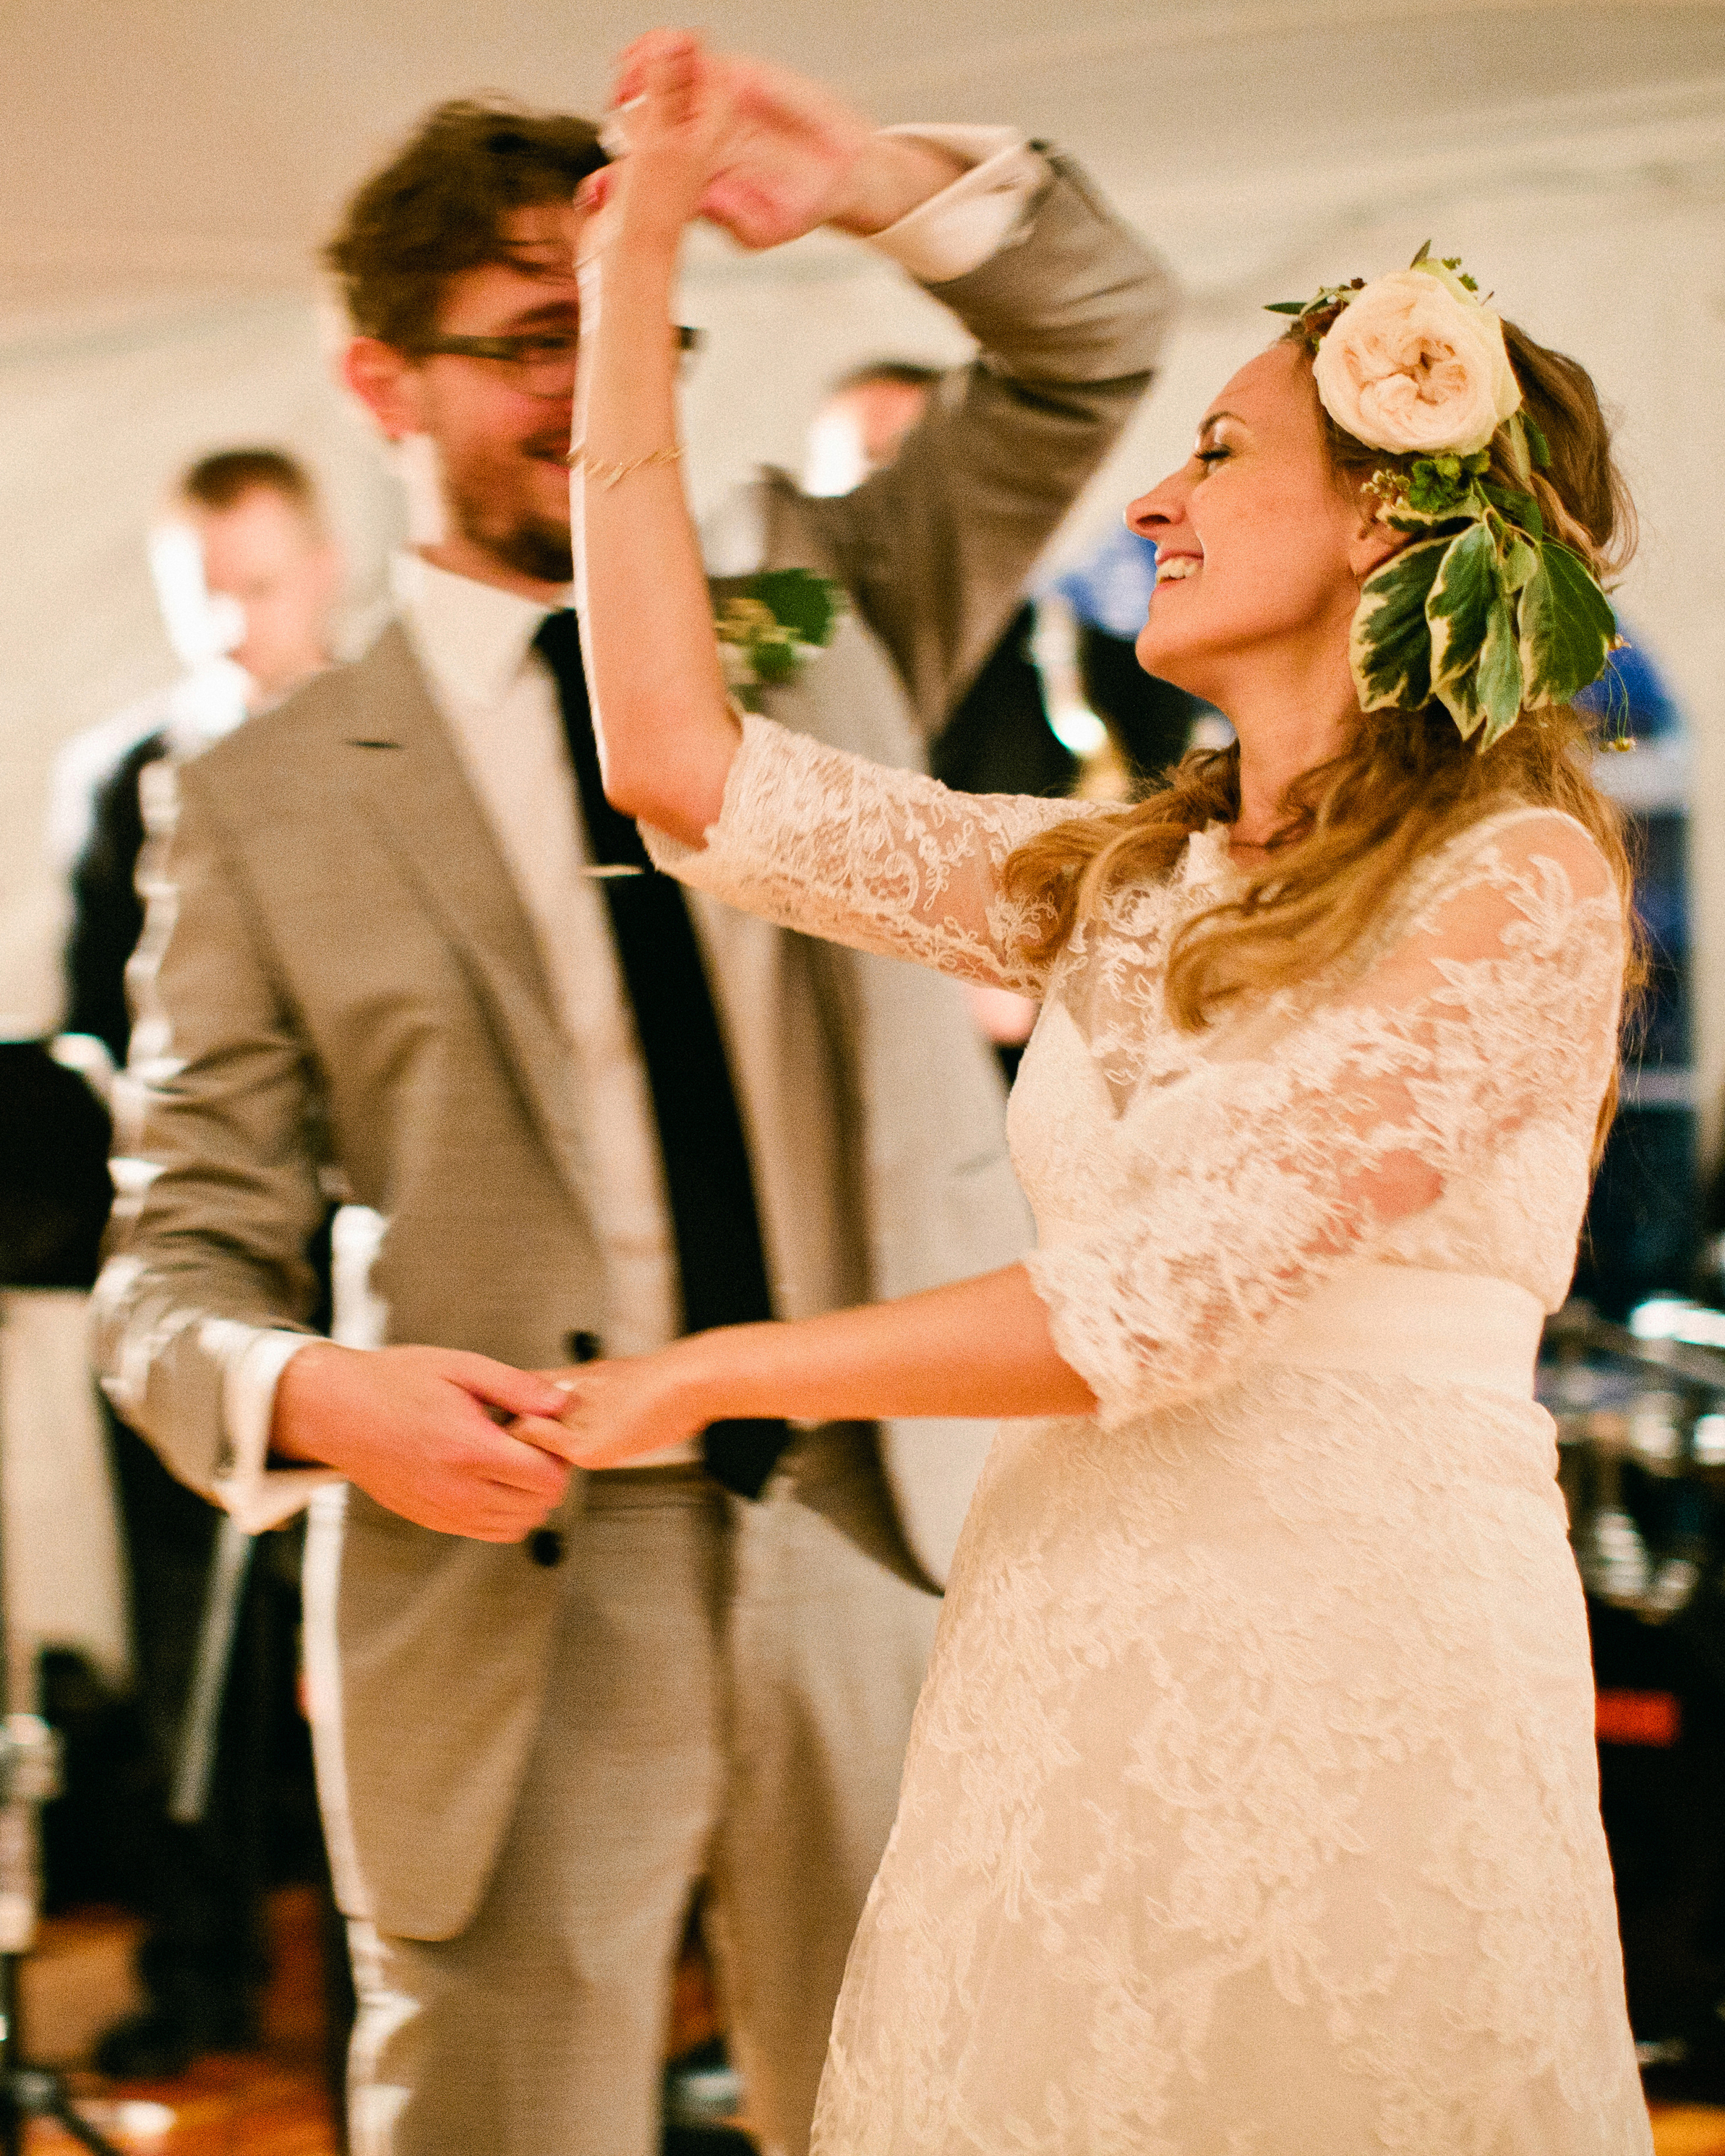 jola-tom-wedding-dance-0614.jpg